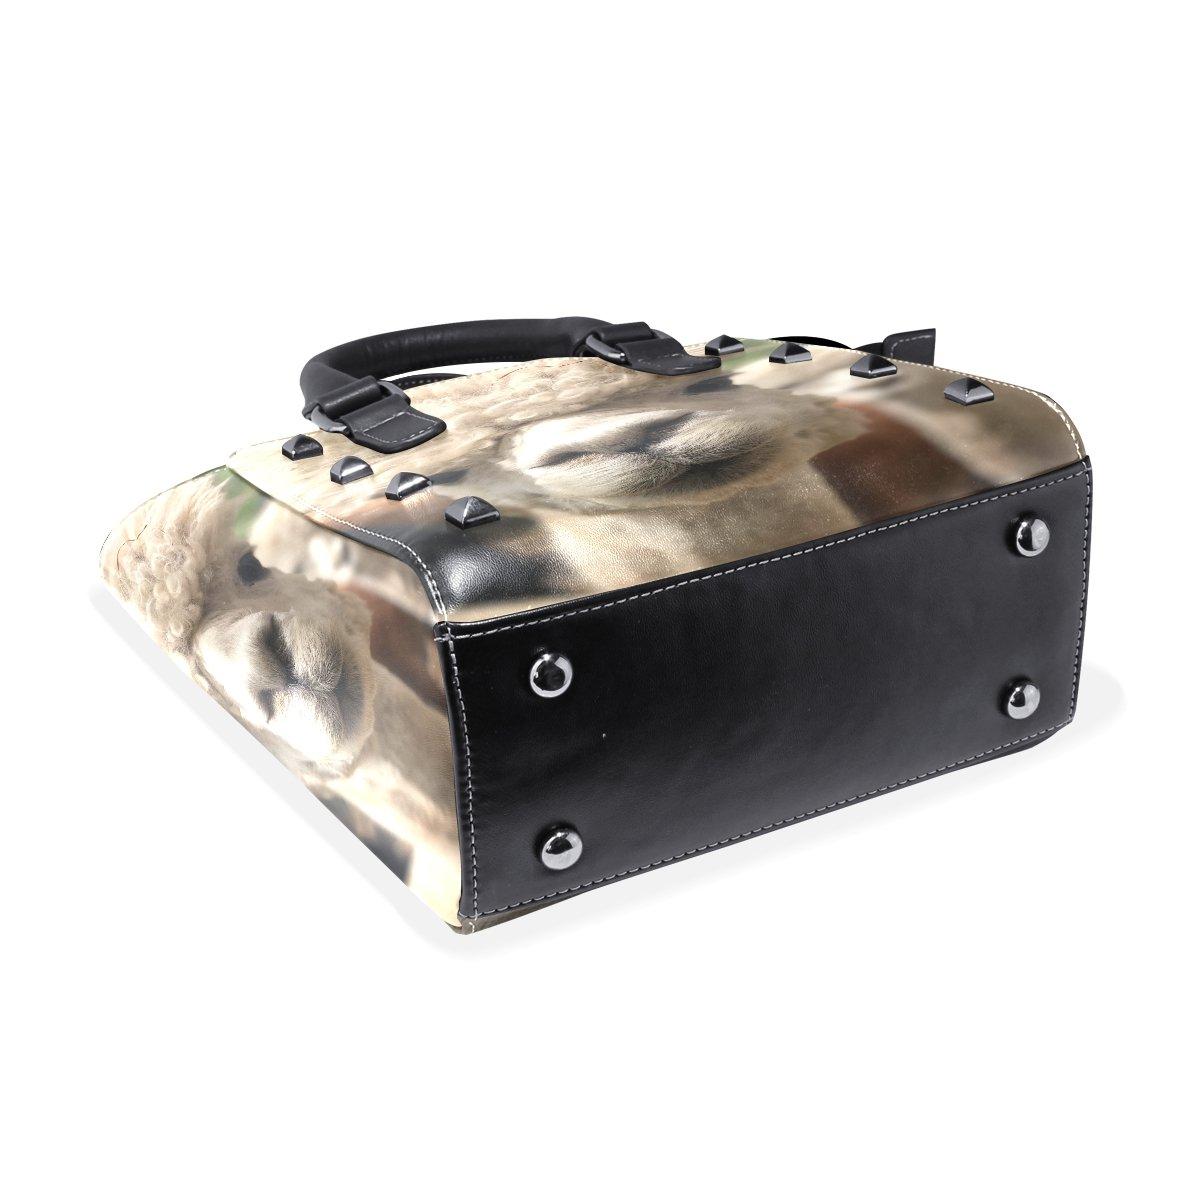 imobaby Animal Alpaca PU Leather Girls Top-Handle Handbags Single-Shoulder Ladies Tote Crossbody Bag Messenger Bags For Women